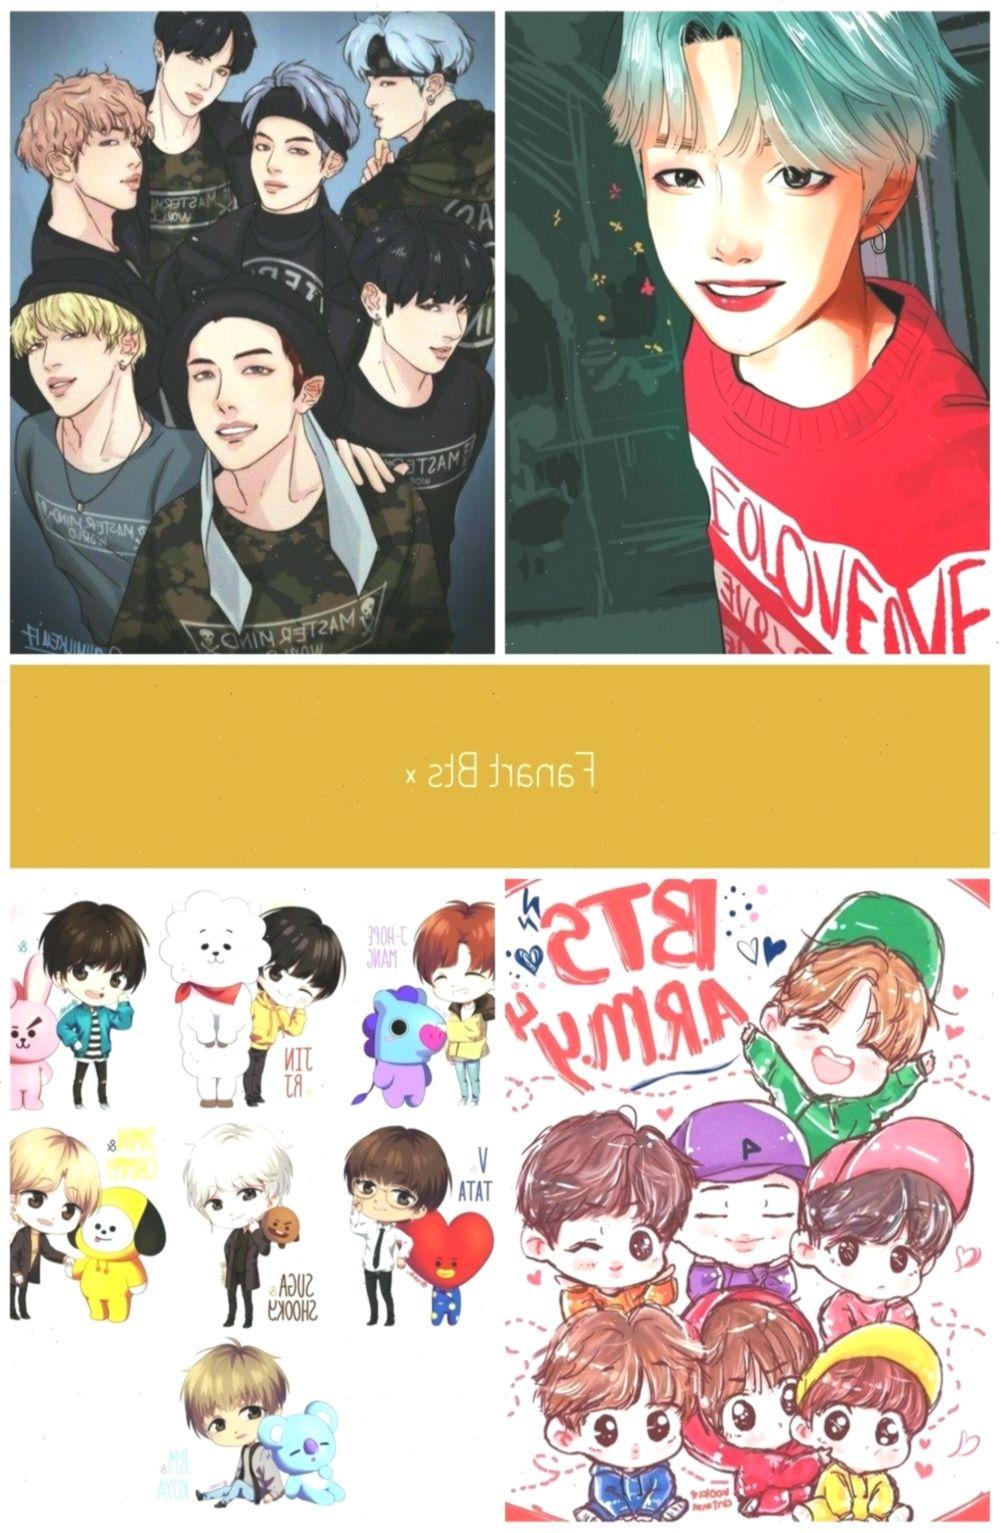 BTS Anime Wallpaper Fanart for Android APK Download bts